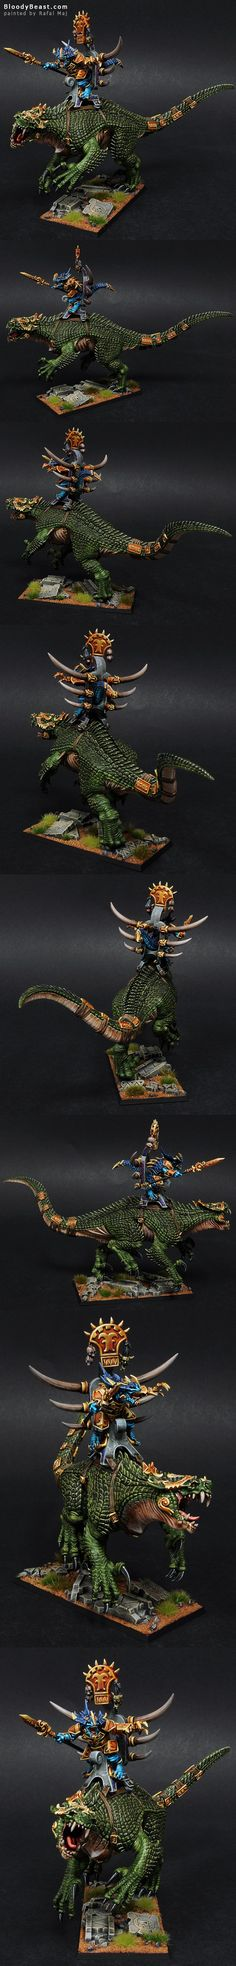 Lizardmen Legendary Saurus Lord Kroq-Gar On Carnosaur Grymloq